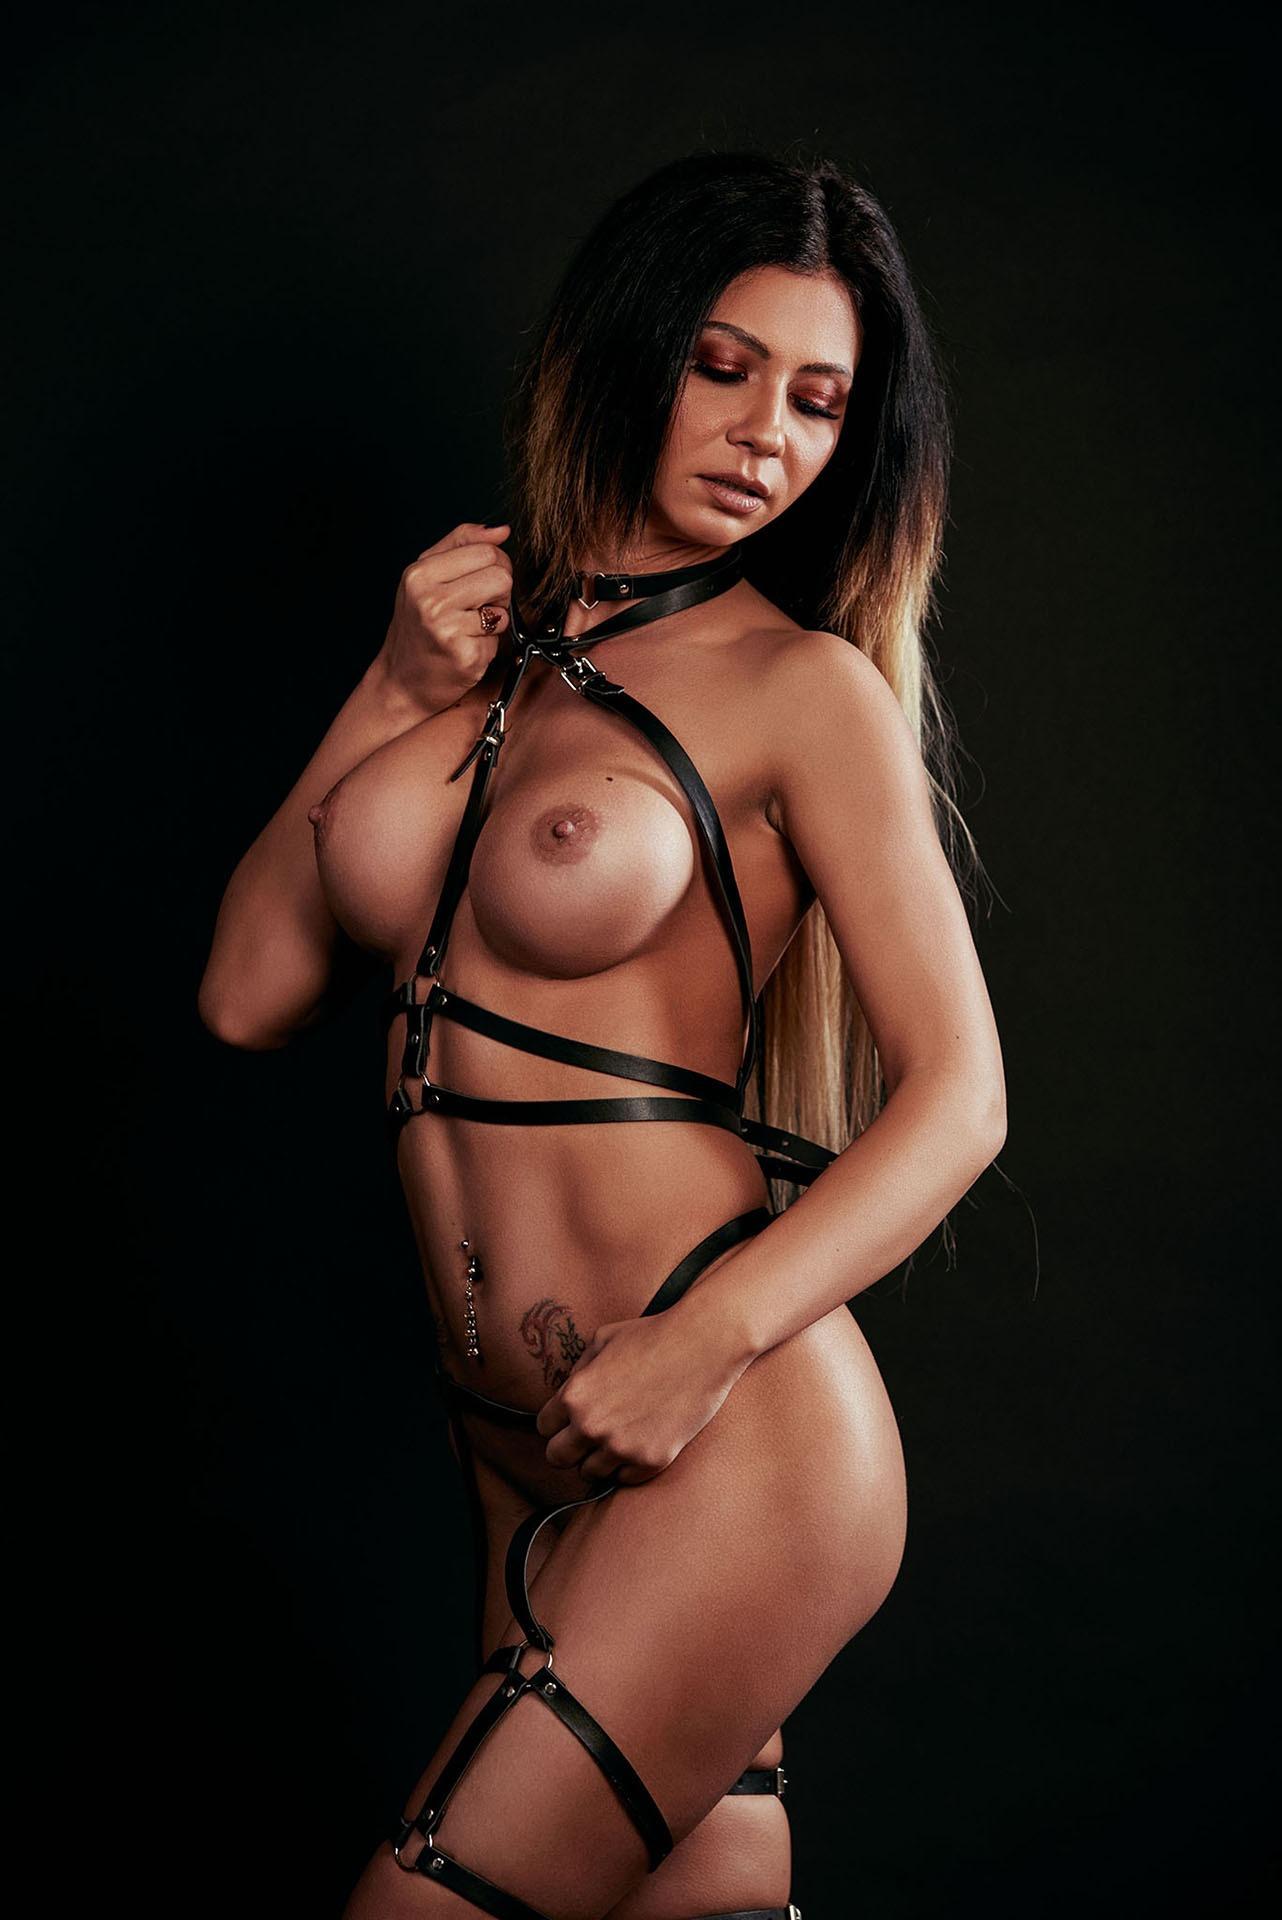 sedinta foto boudoir, boudoir, shooting, sedinta foto, model, erotic, sexy, sensual, booty, lingerie, lenjerie, fotograf profesionist, fetish, retouch, dark, fotograf nud, fotograf profesionist nud, sedinta foto sexy, sedinta nud, boudoir nud